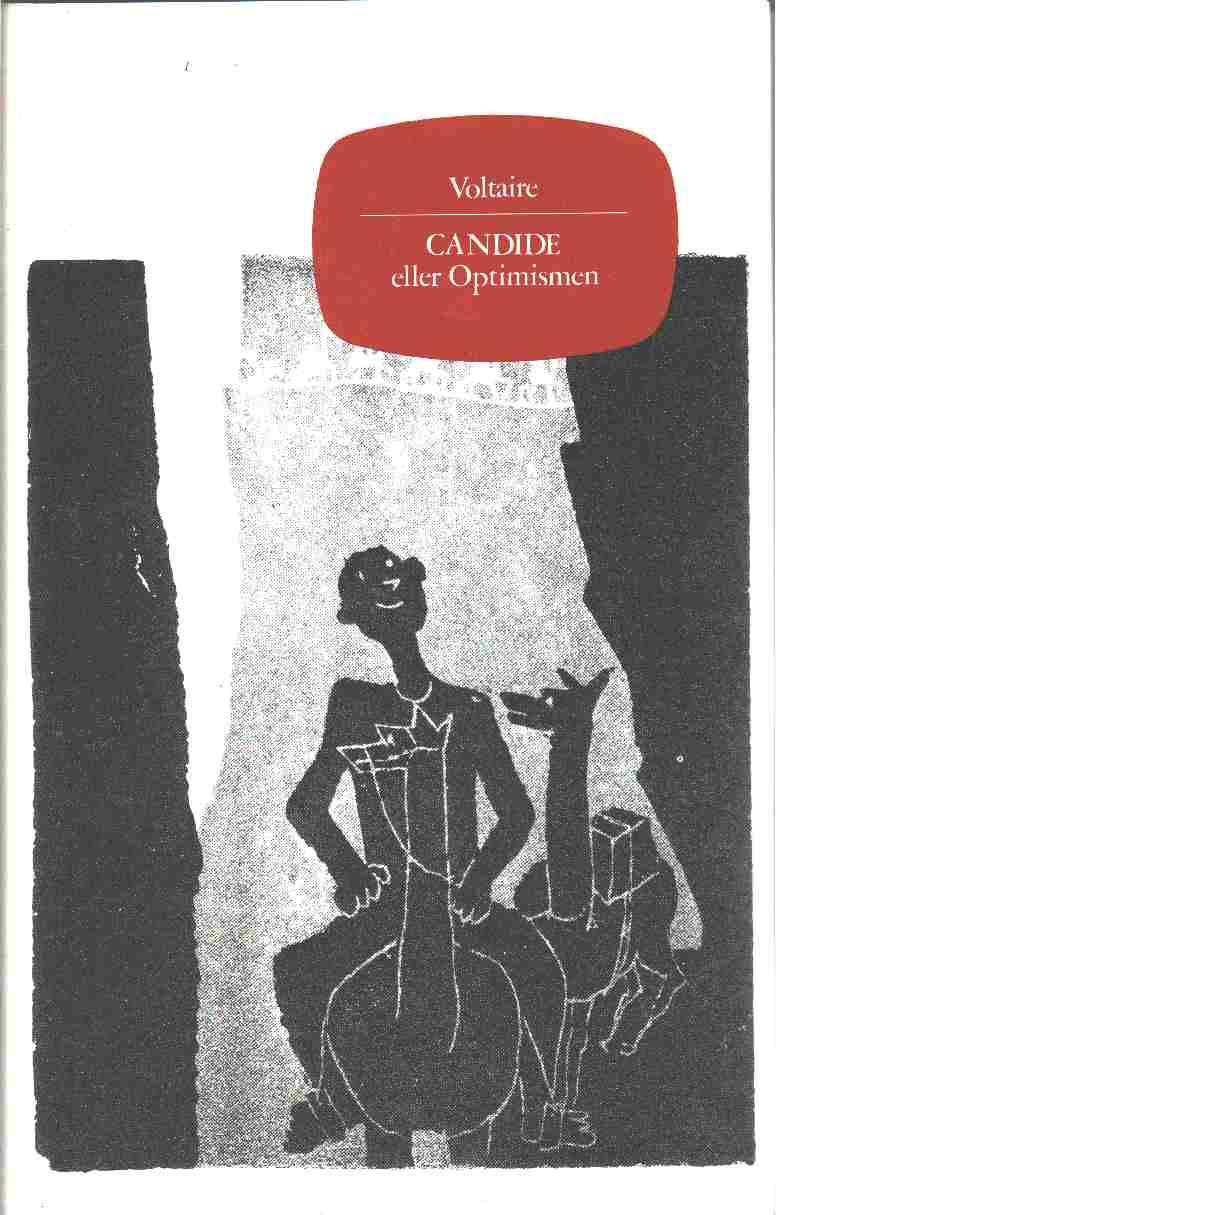 Candide eller Optimismen - Voltaire